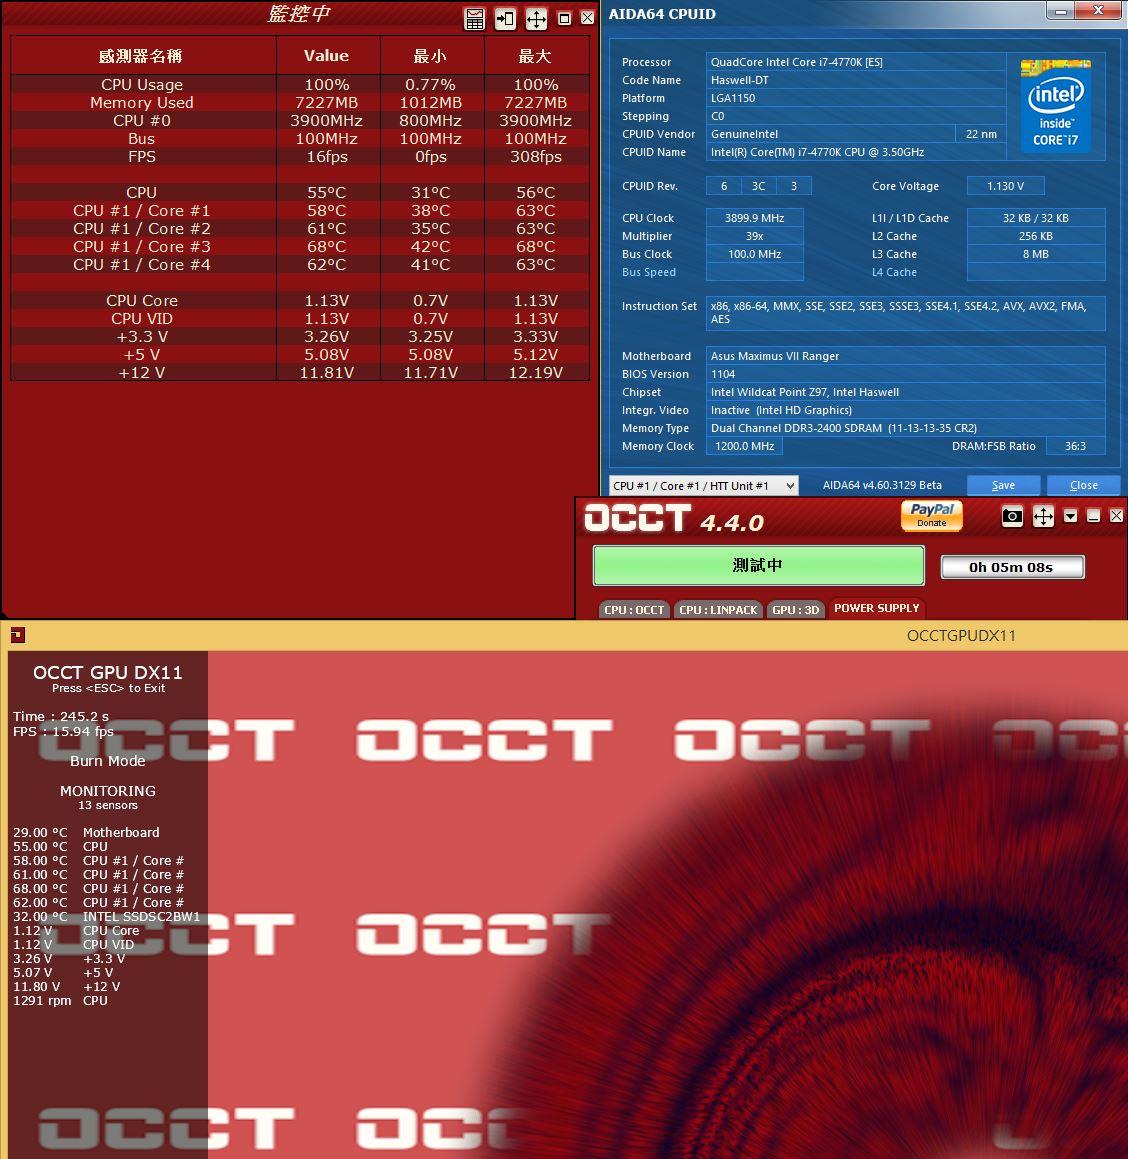 [XF] 編織繩上身展現高效率 模組化電源再進化BitFenix FURY 550G 550W評測